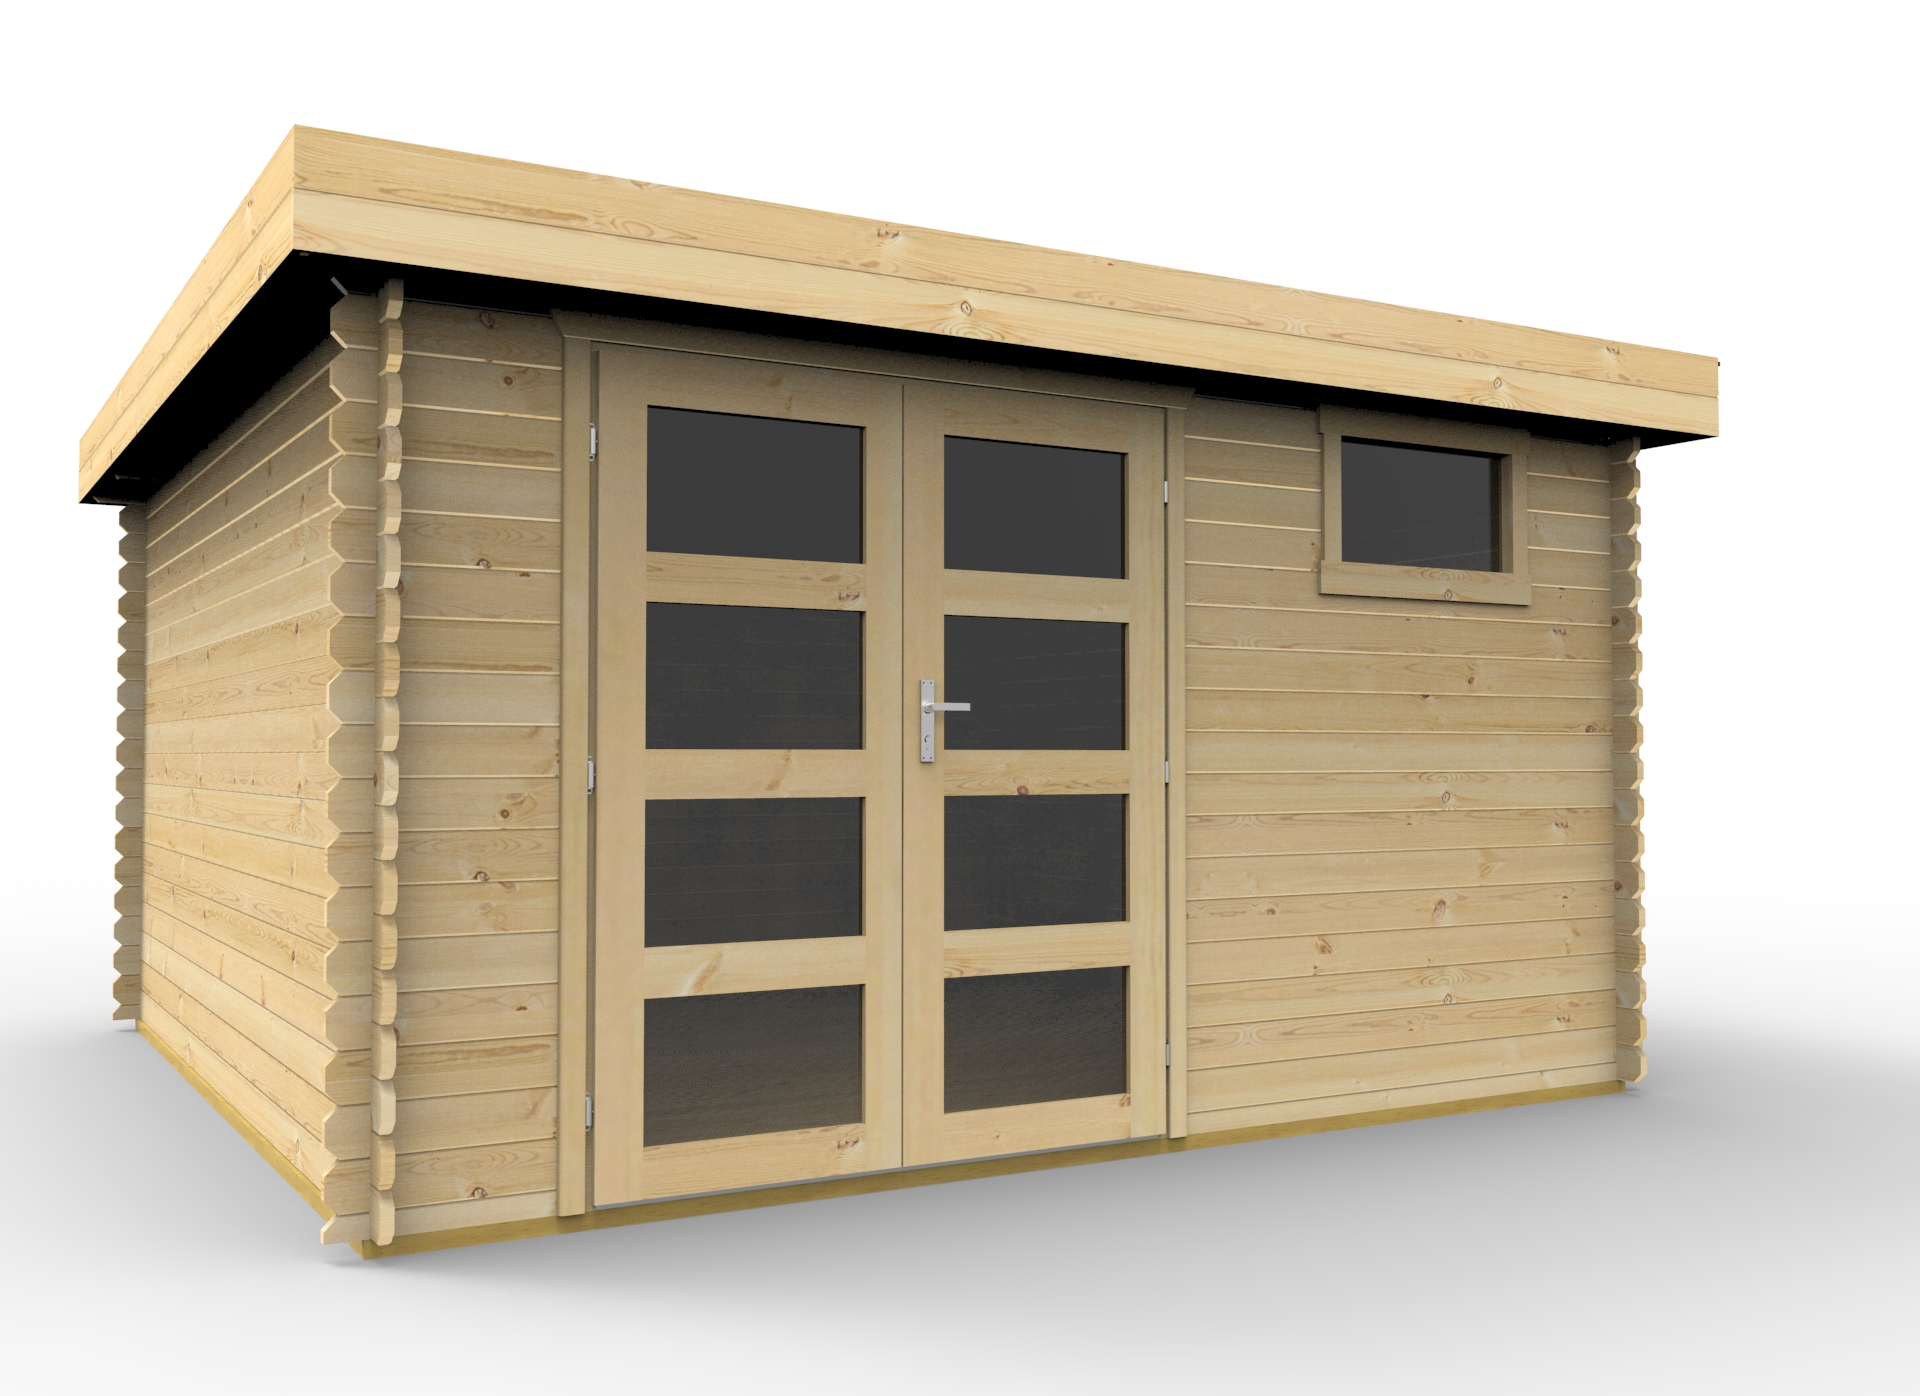 gartenhaus blockhaus ger tehaus holz 390x300 40 mm 4039201. Black Bedroom Furniture Sets. Home Design Ideas